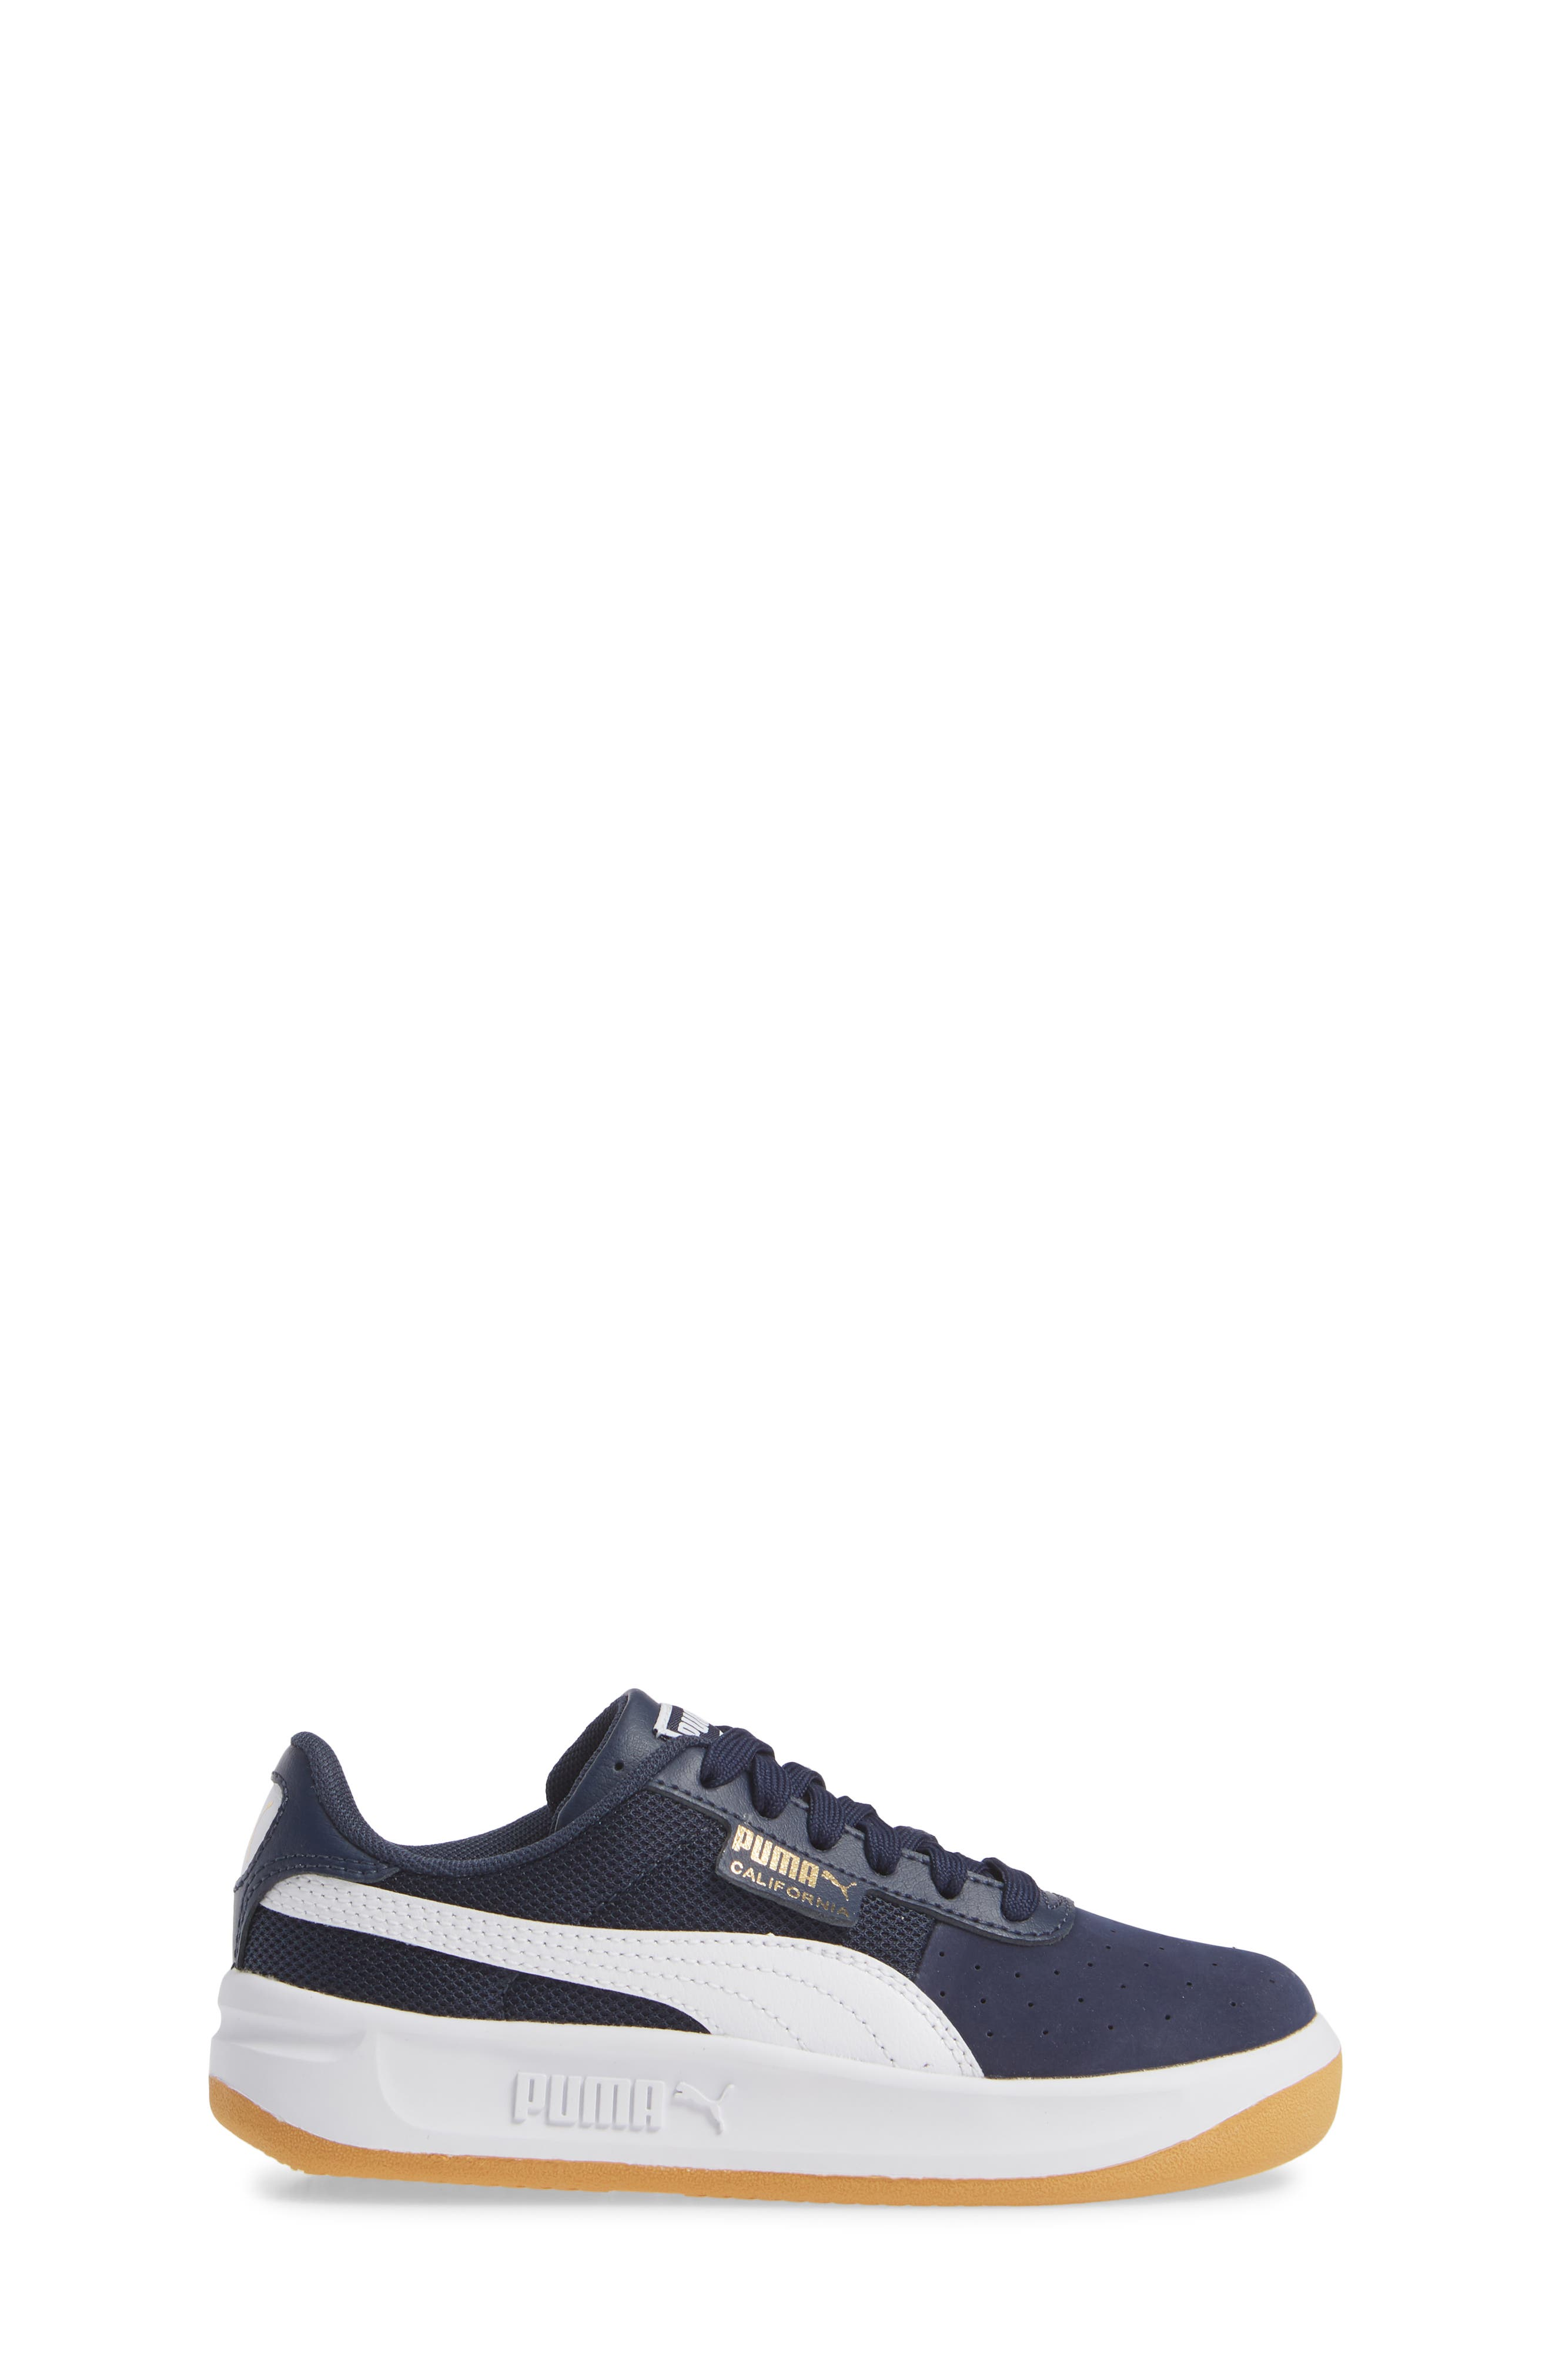 California Casual Jr. Sneaker,                             Alternate thumbnail 3, color,                             PEACOAT-PUMA WHITE-GOLD